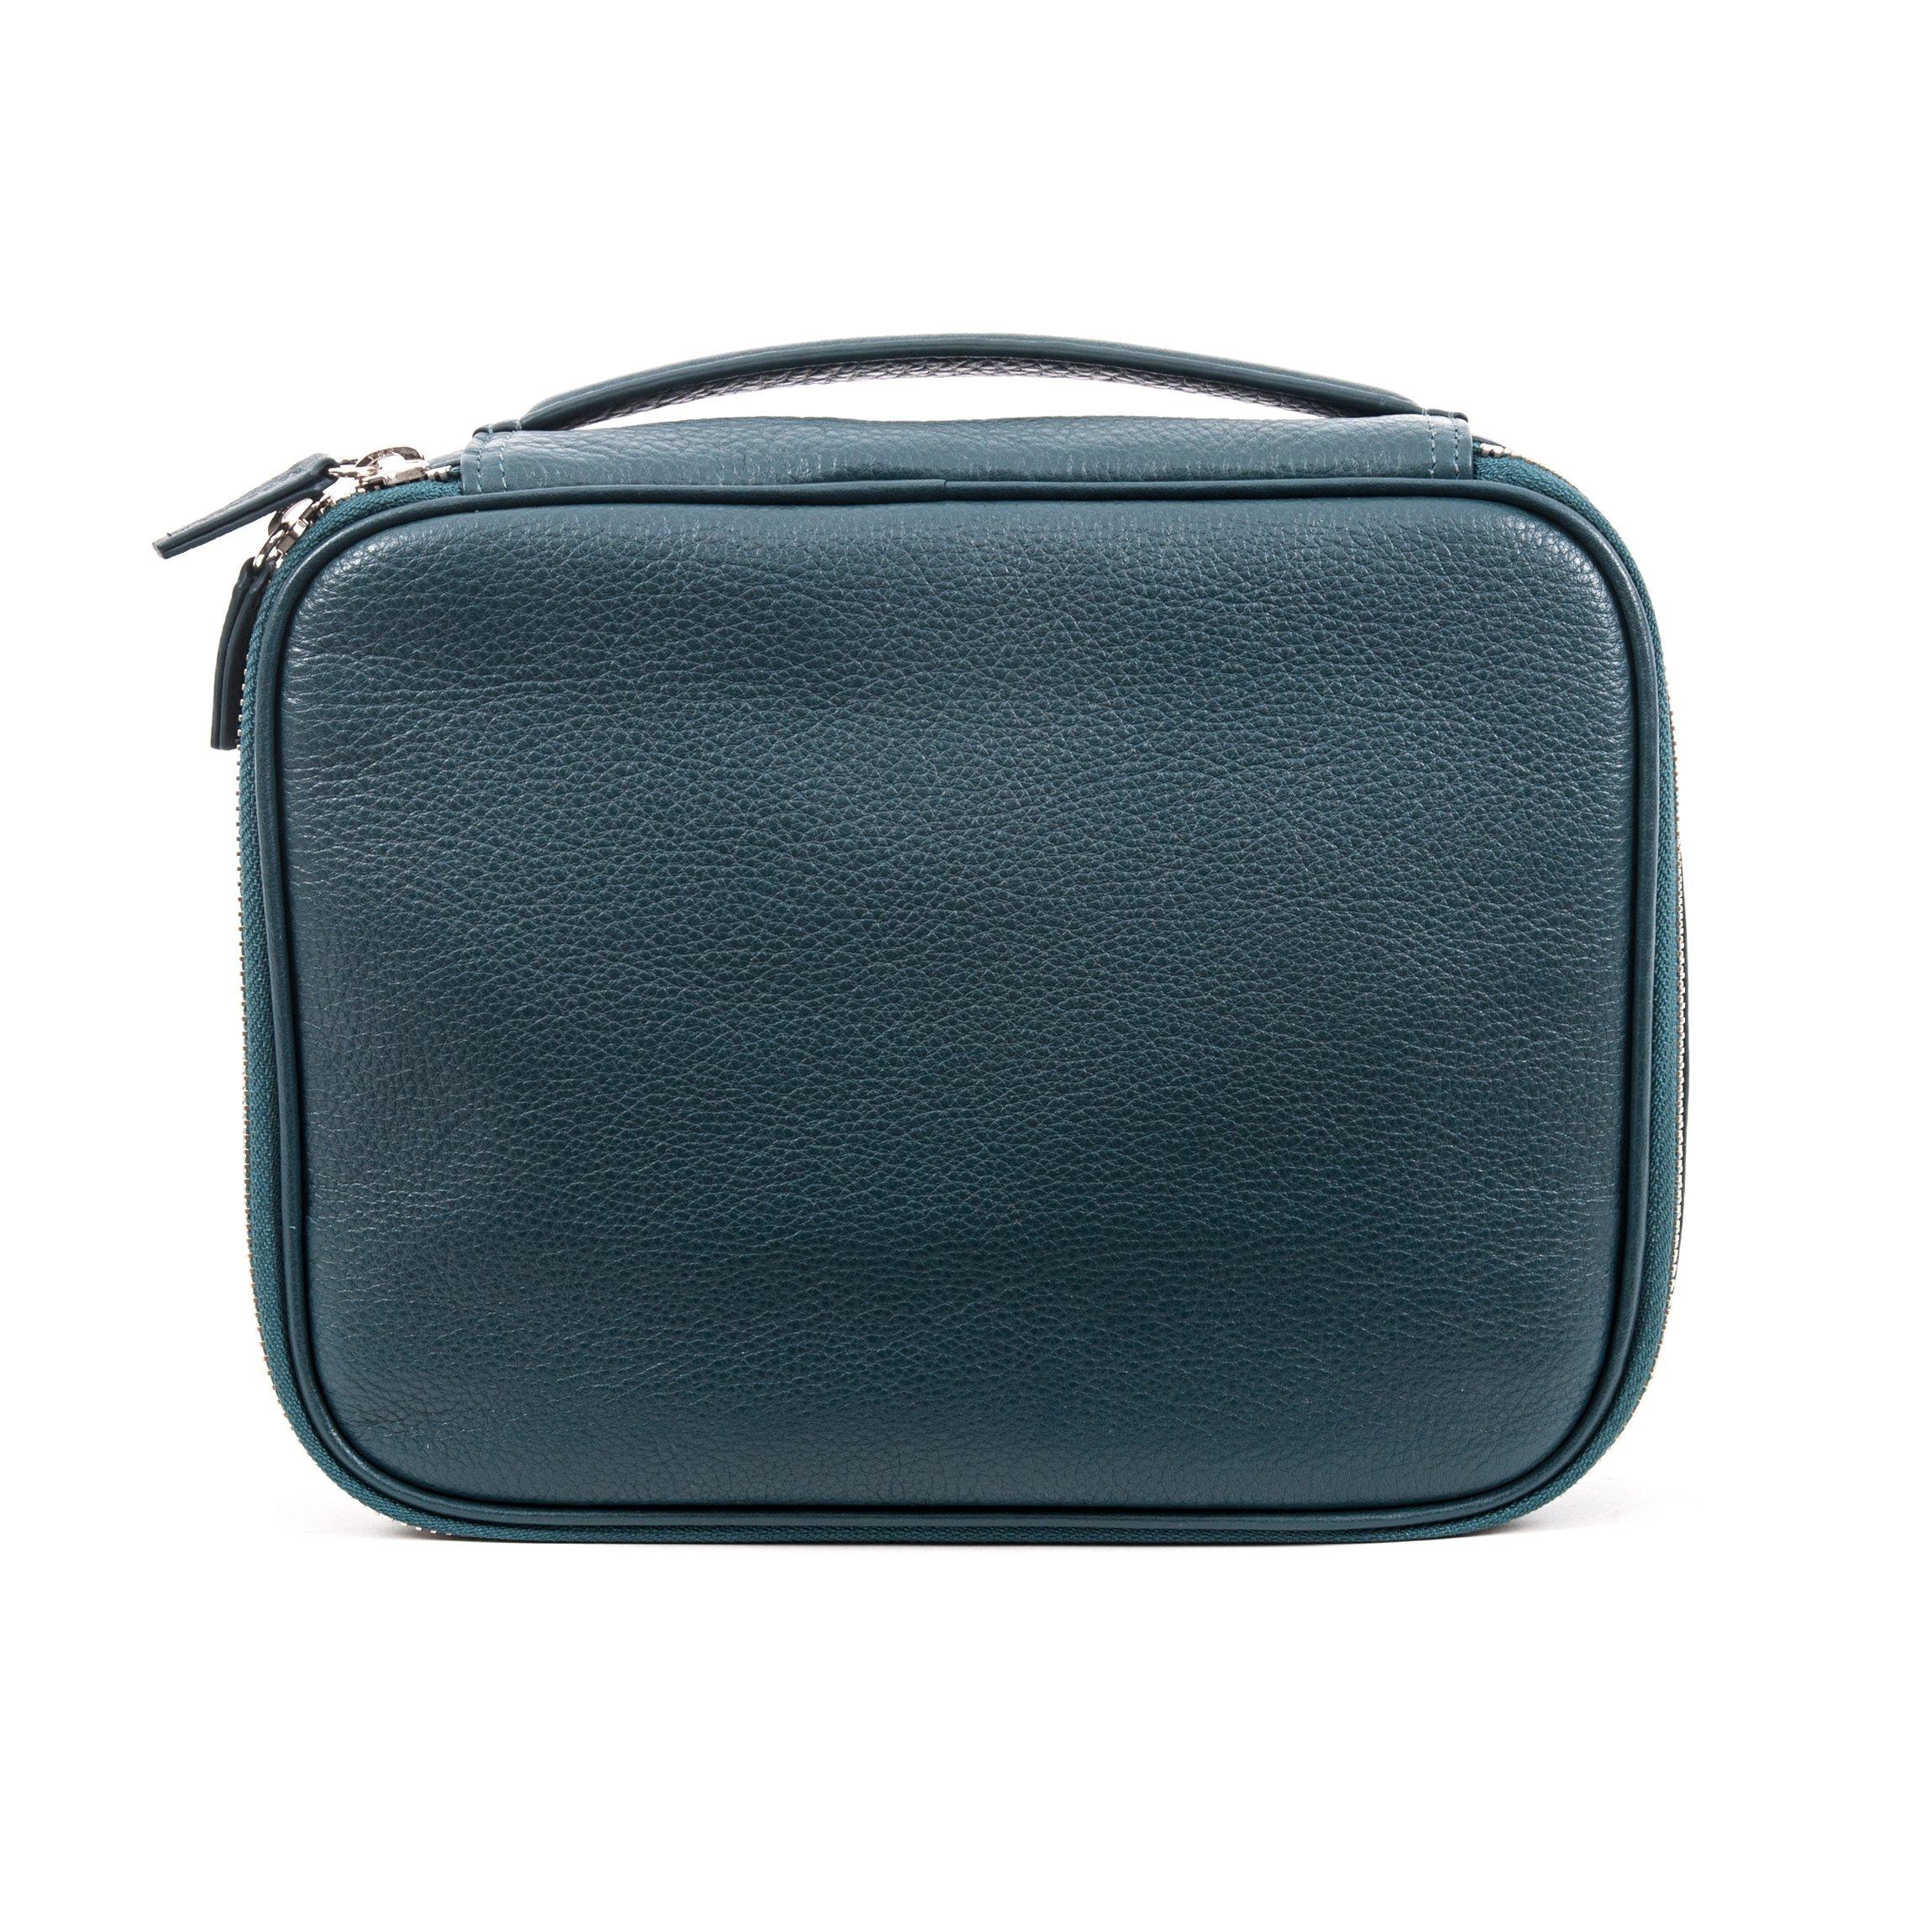 Leatherology Large Travel Organizer - Full Grain Leather Leather - Viridian (green)